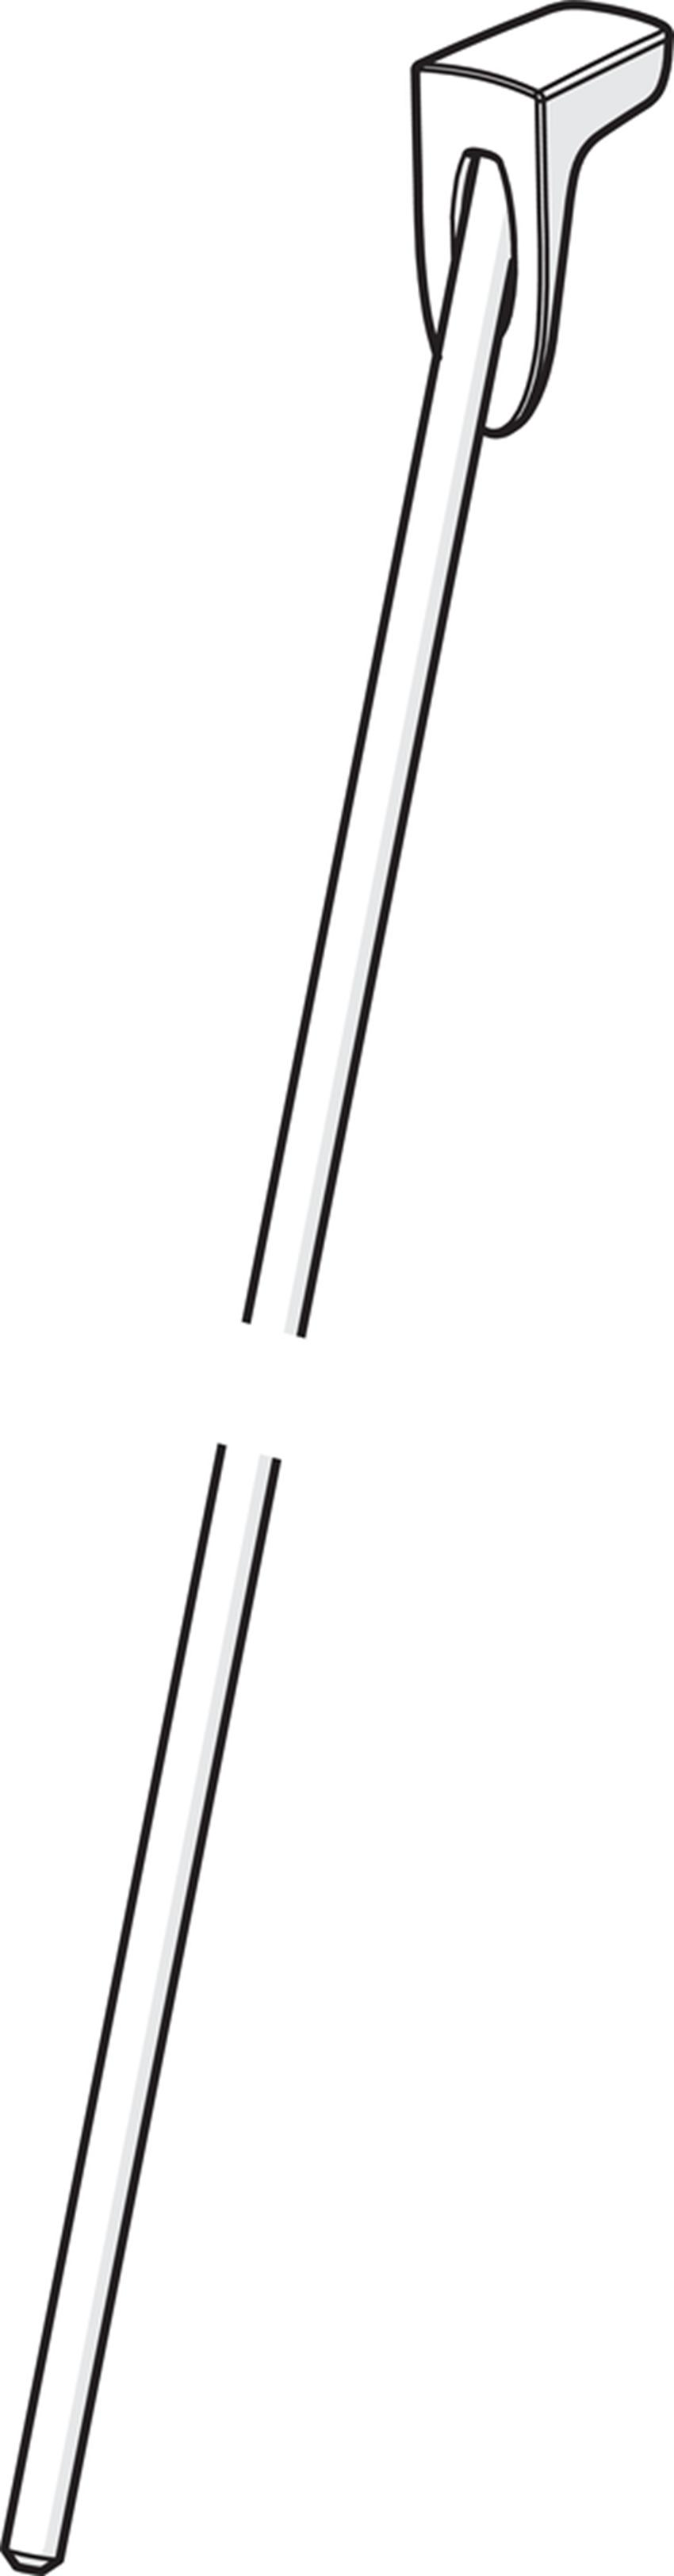 Dźwignia Oras Safira 1000681V